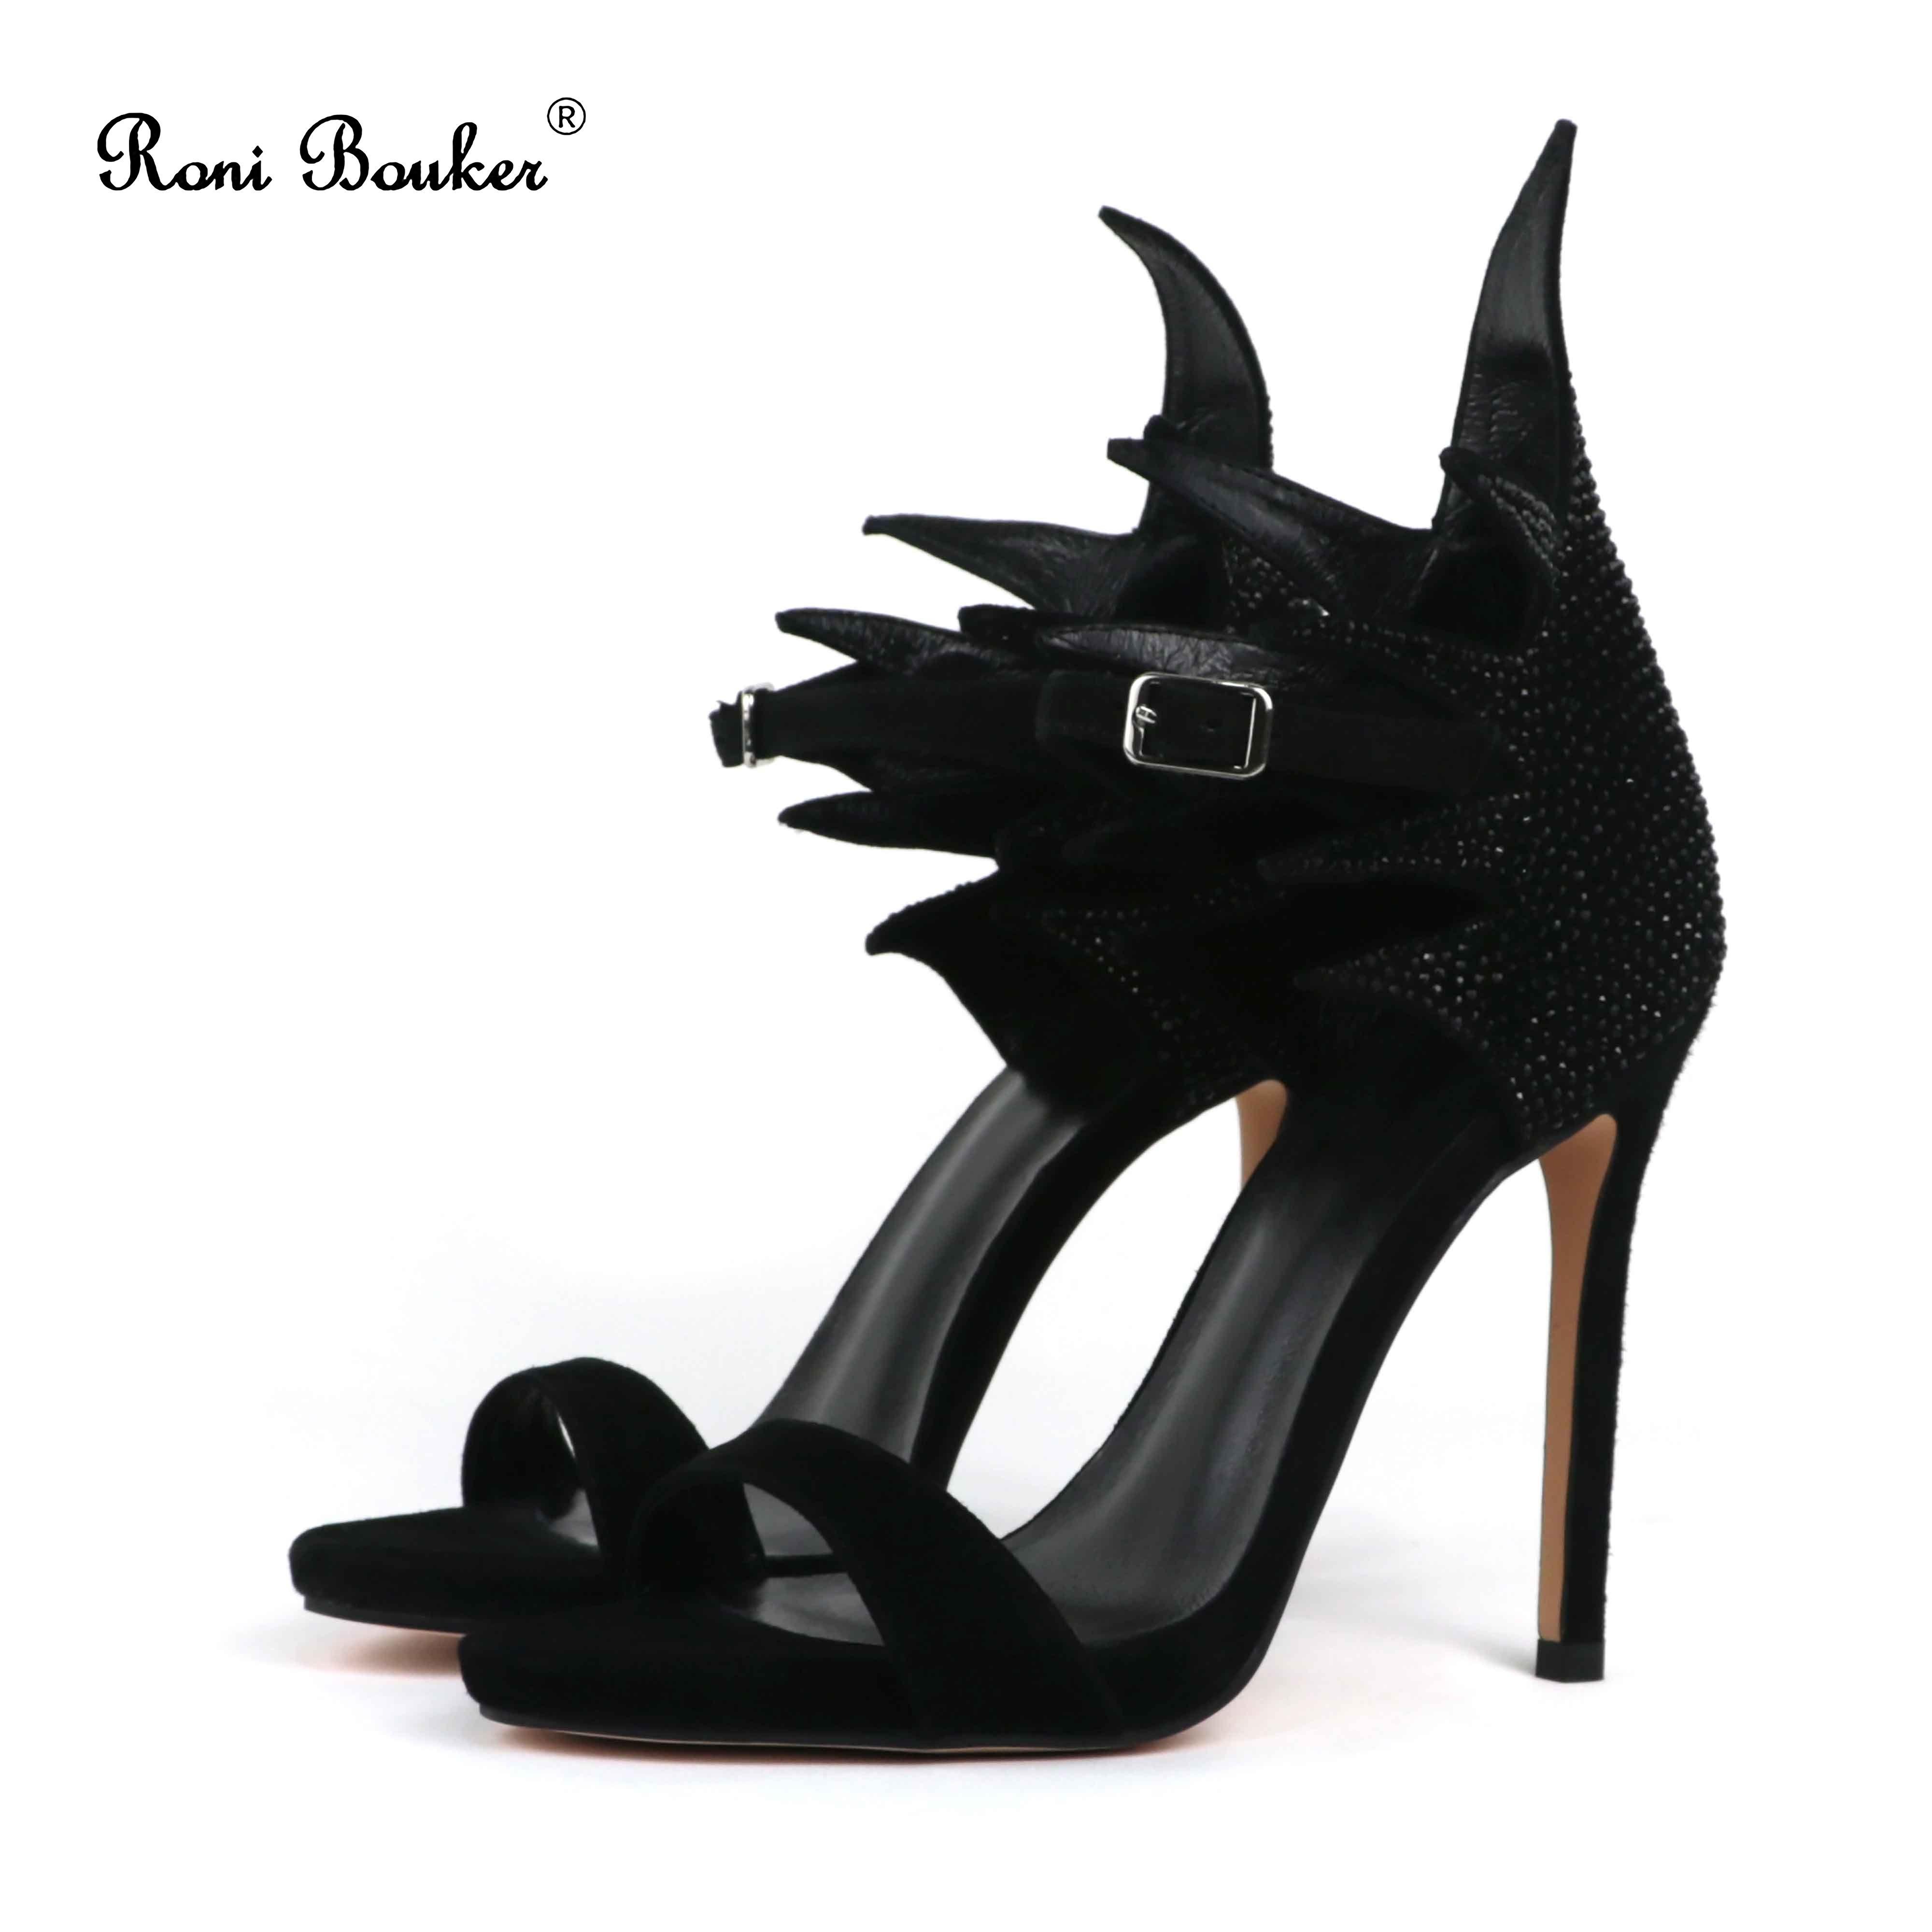 0ba9794d045e0 Women Sandals Fashion Peep Toe Summer Shoes 2018 Hot Selling Ankle ...